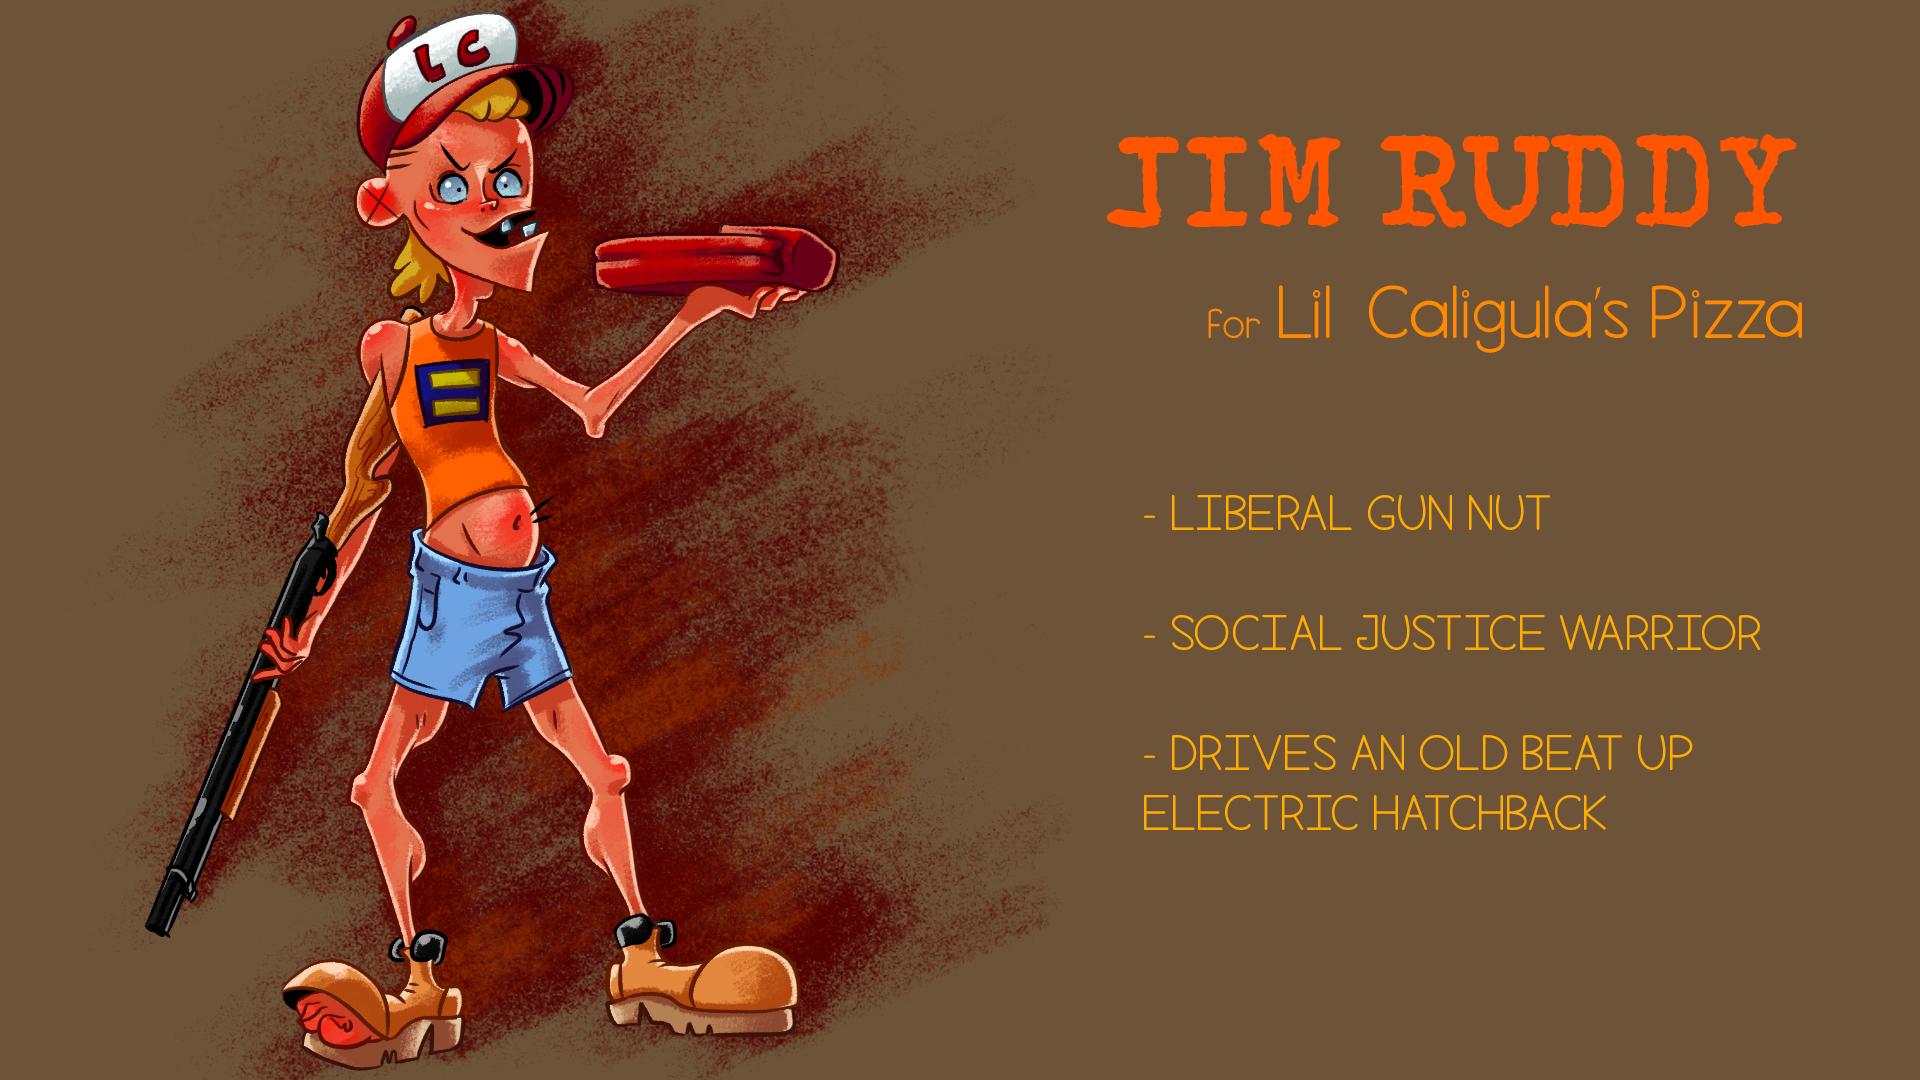 JimRuddy